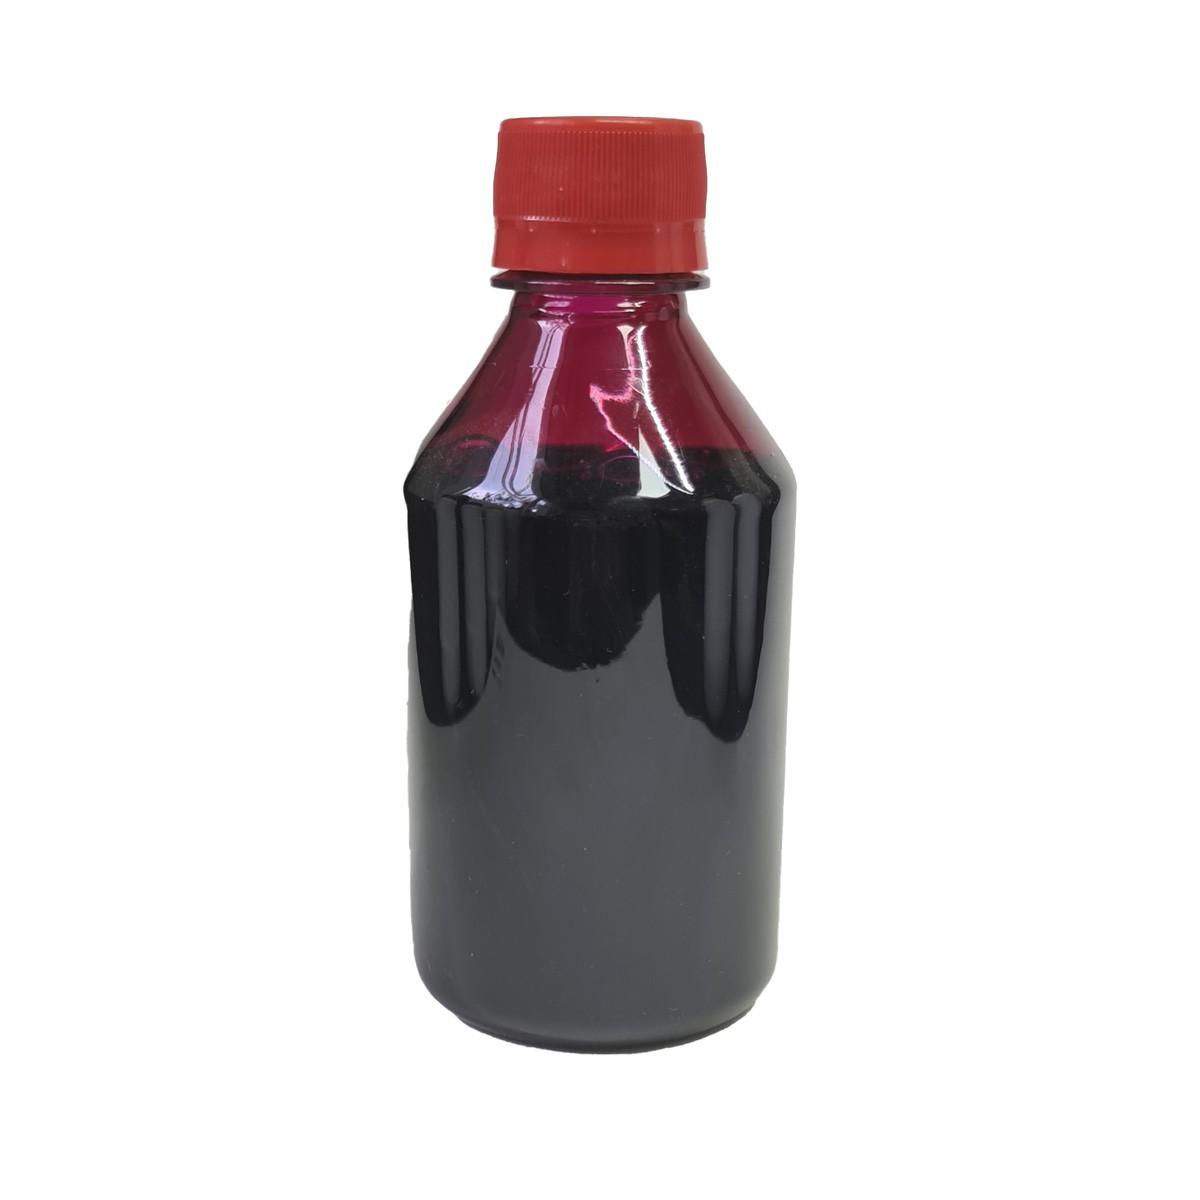 250ml de tinta Magenta para recarga de cartuchos